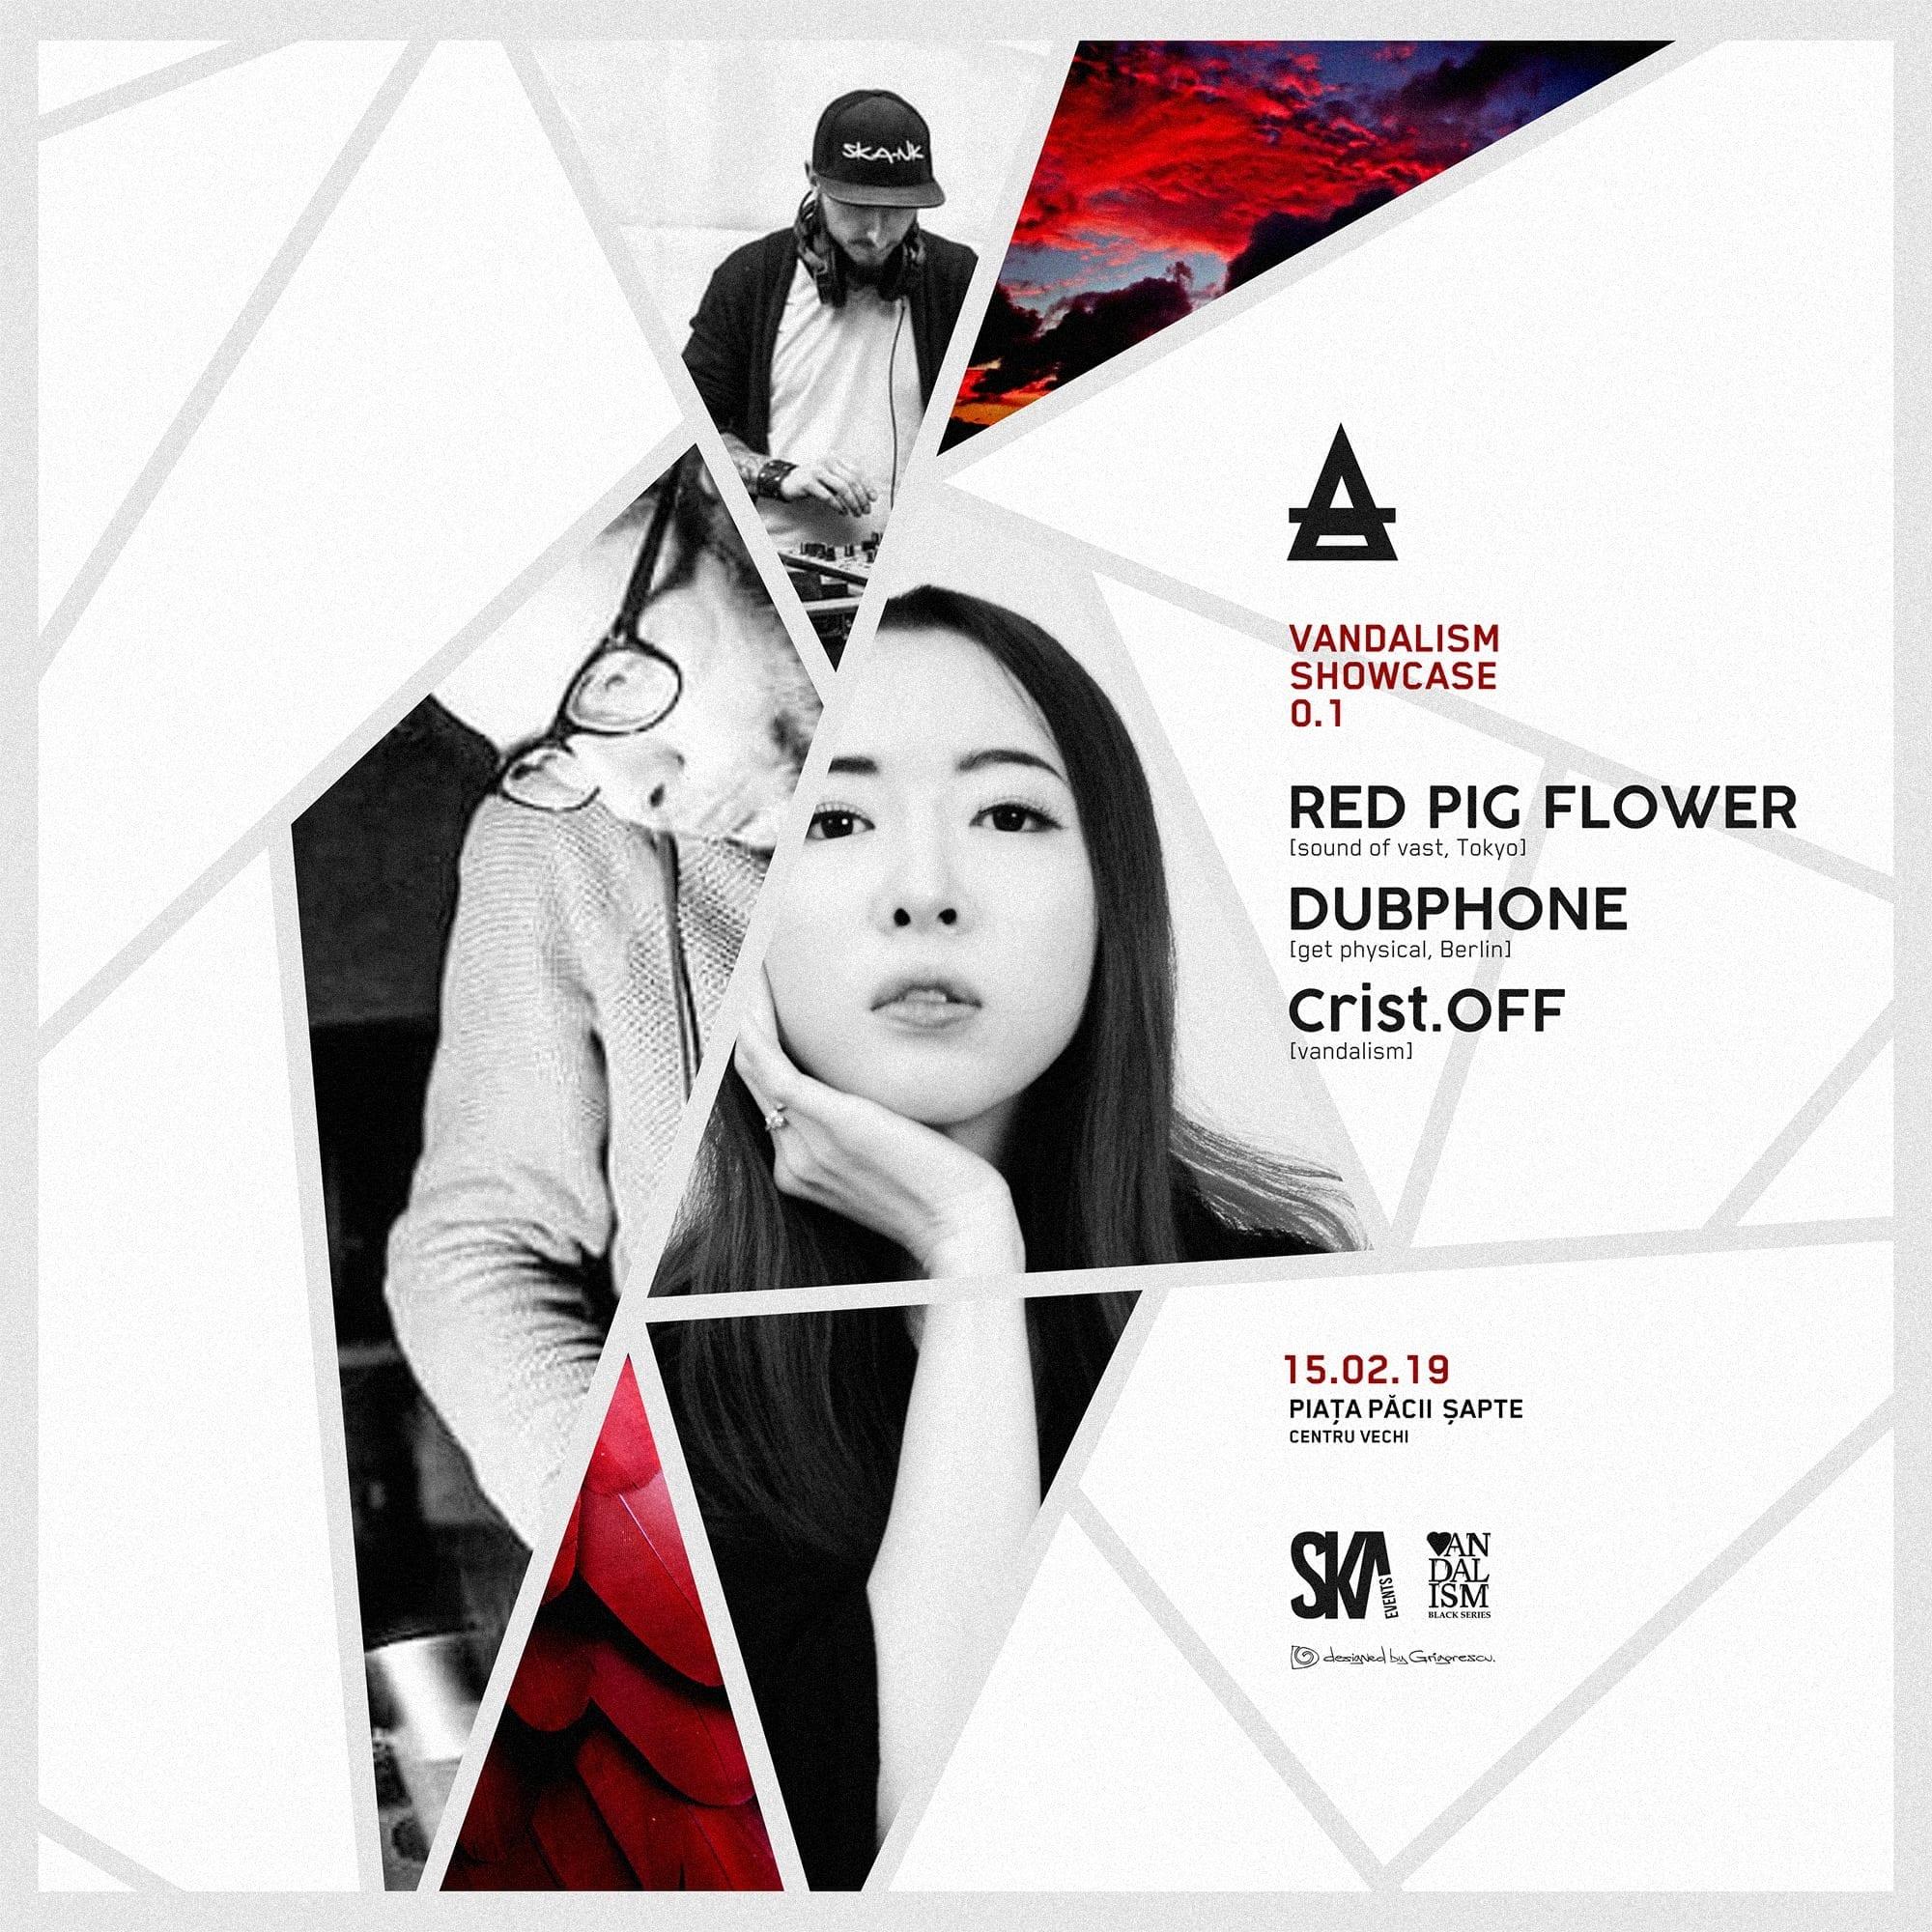 VM Showcase 0.1 - Red Pig Flower (Tokyo) x Dubphone x CristOFF @Taboo Pub &Club Baia Mare